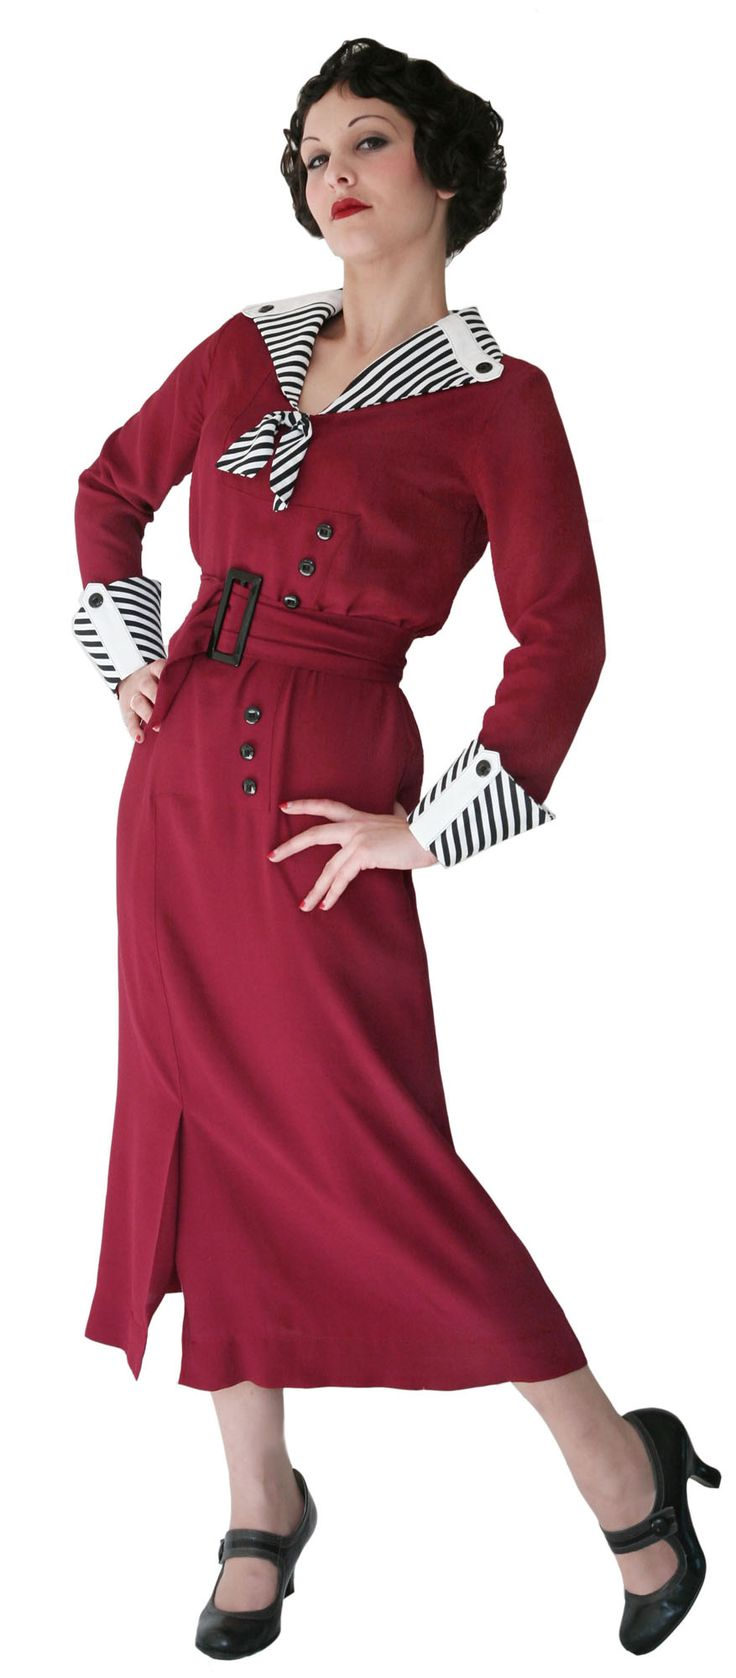 1930s vintage style dresses